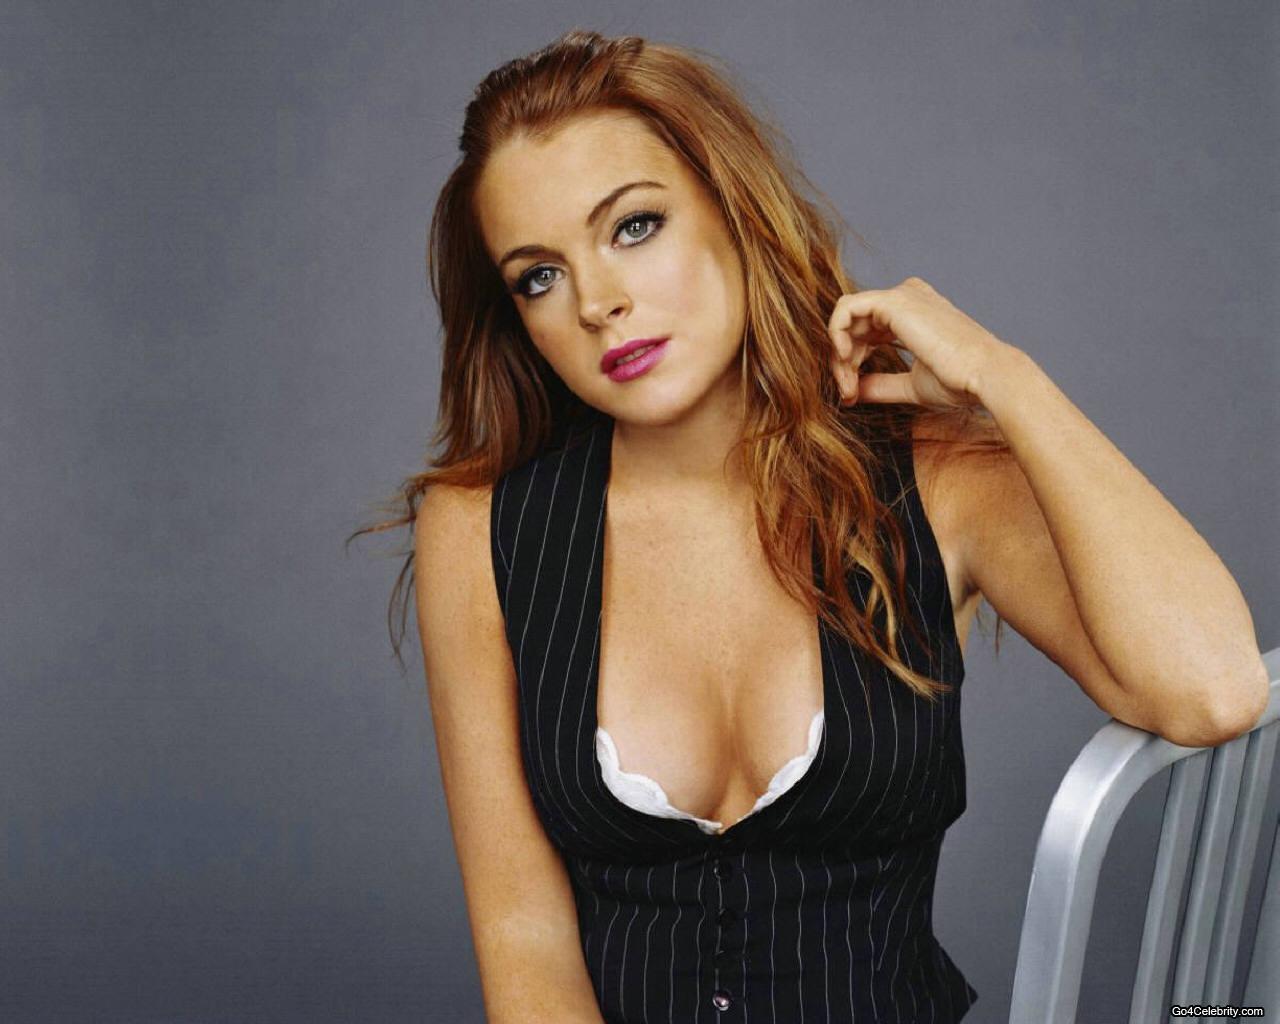 http://images2.fanpop.com/images/photos/4100000/Lindsay-Lohan-lindsay-lohan-4103675-1280-1024.jpg